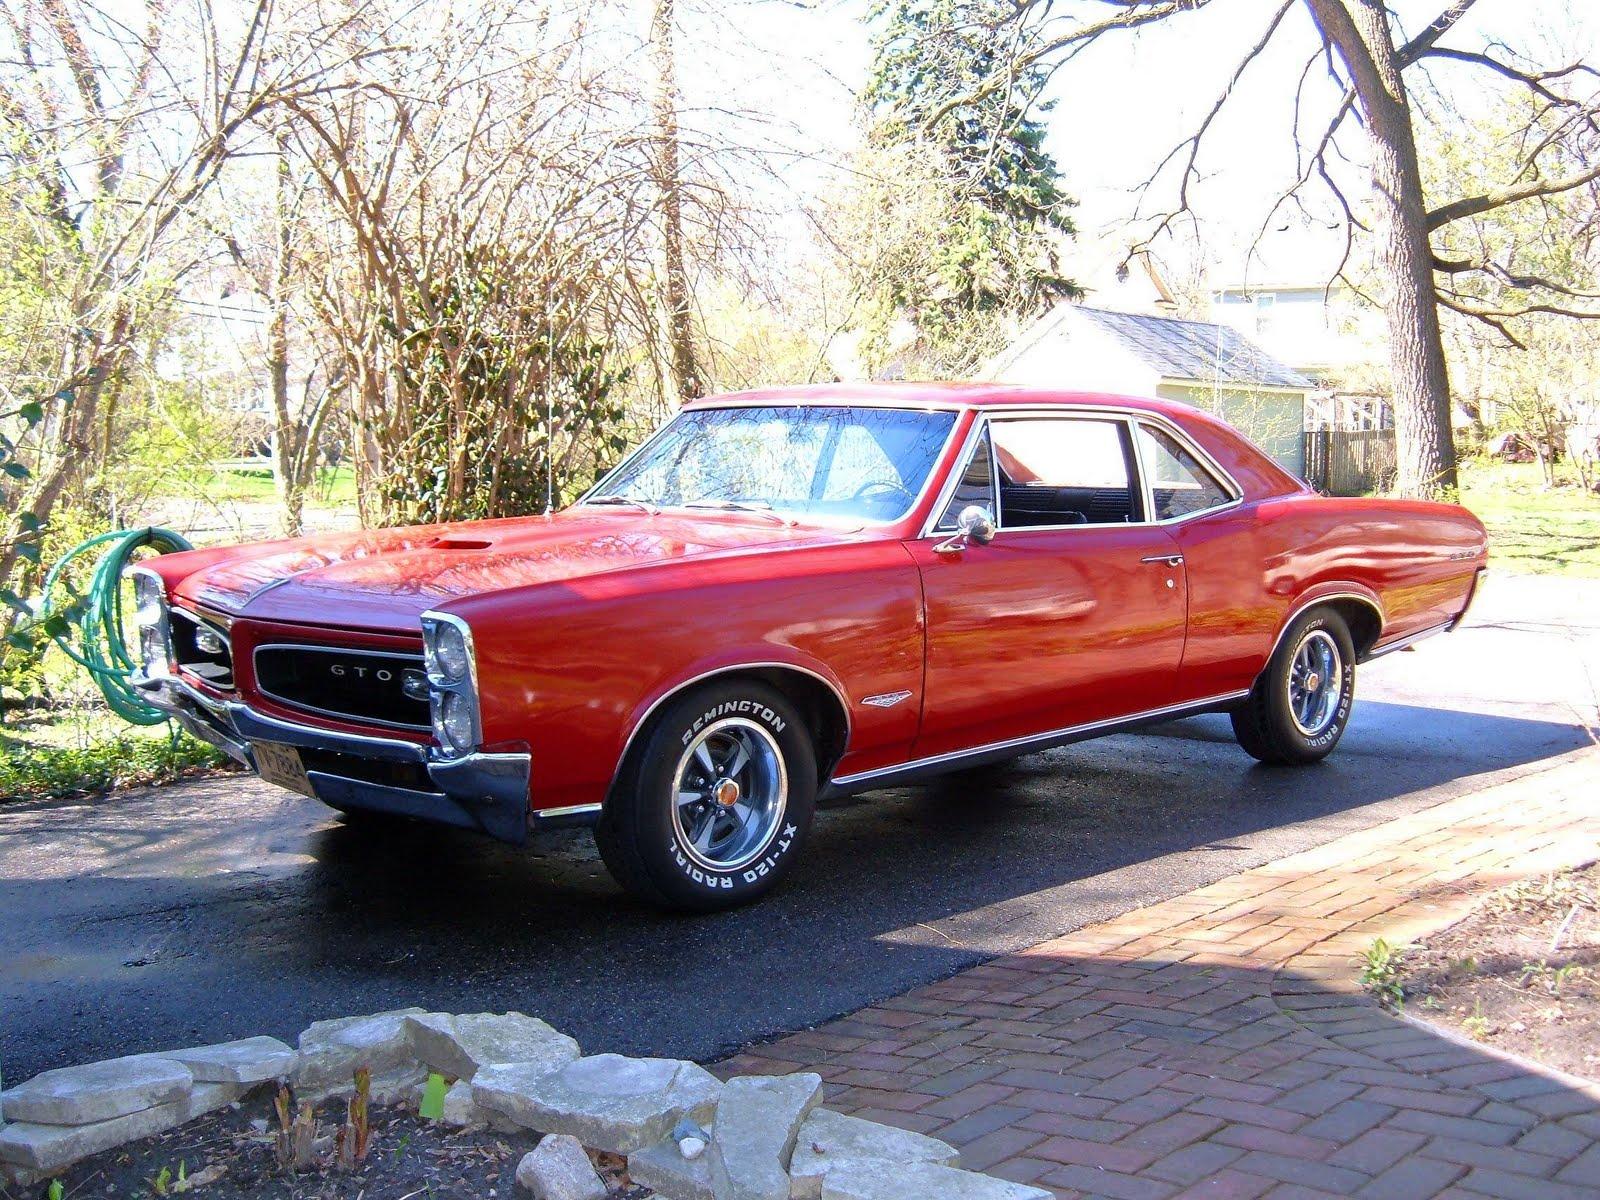 http://1.bp.blogspot.com/-6J8RlNEvAIE/TcWvDv4GHwI/AAAAAAAAFC4/nJg3OdlG7sE/s1600/Pontiac_GTO_1966.jpg